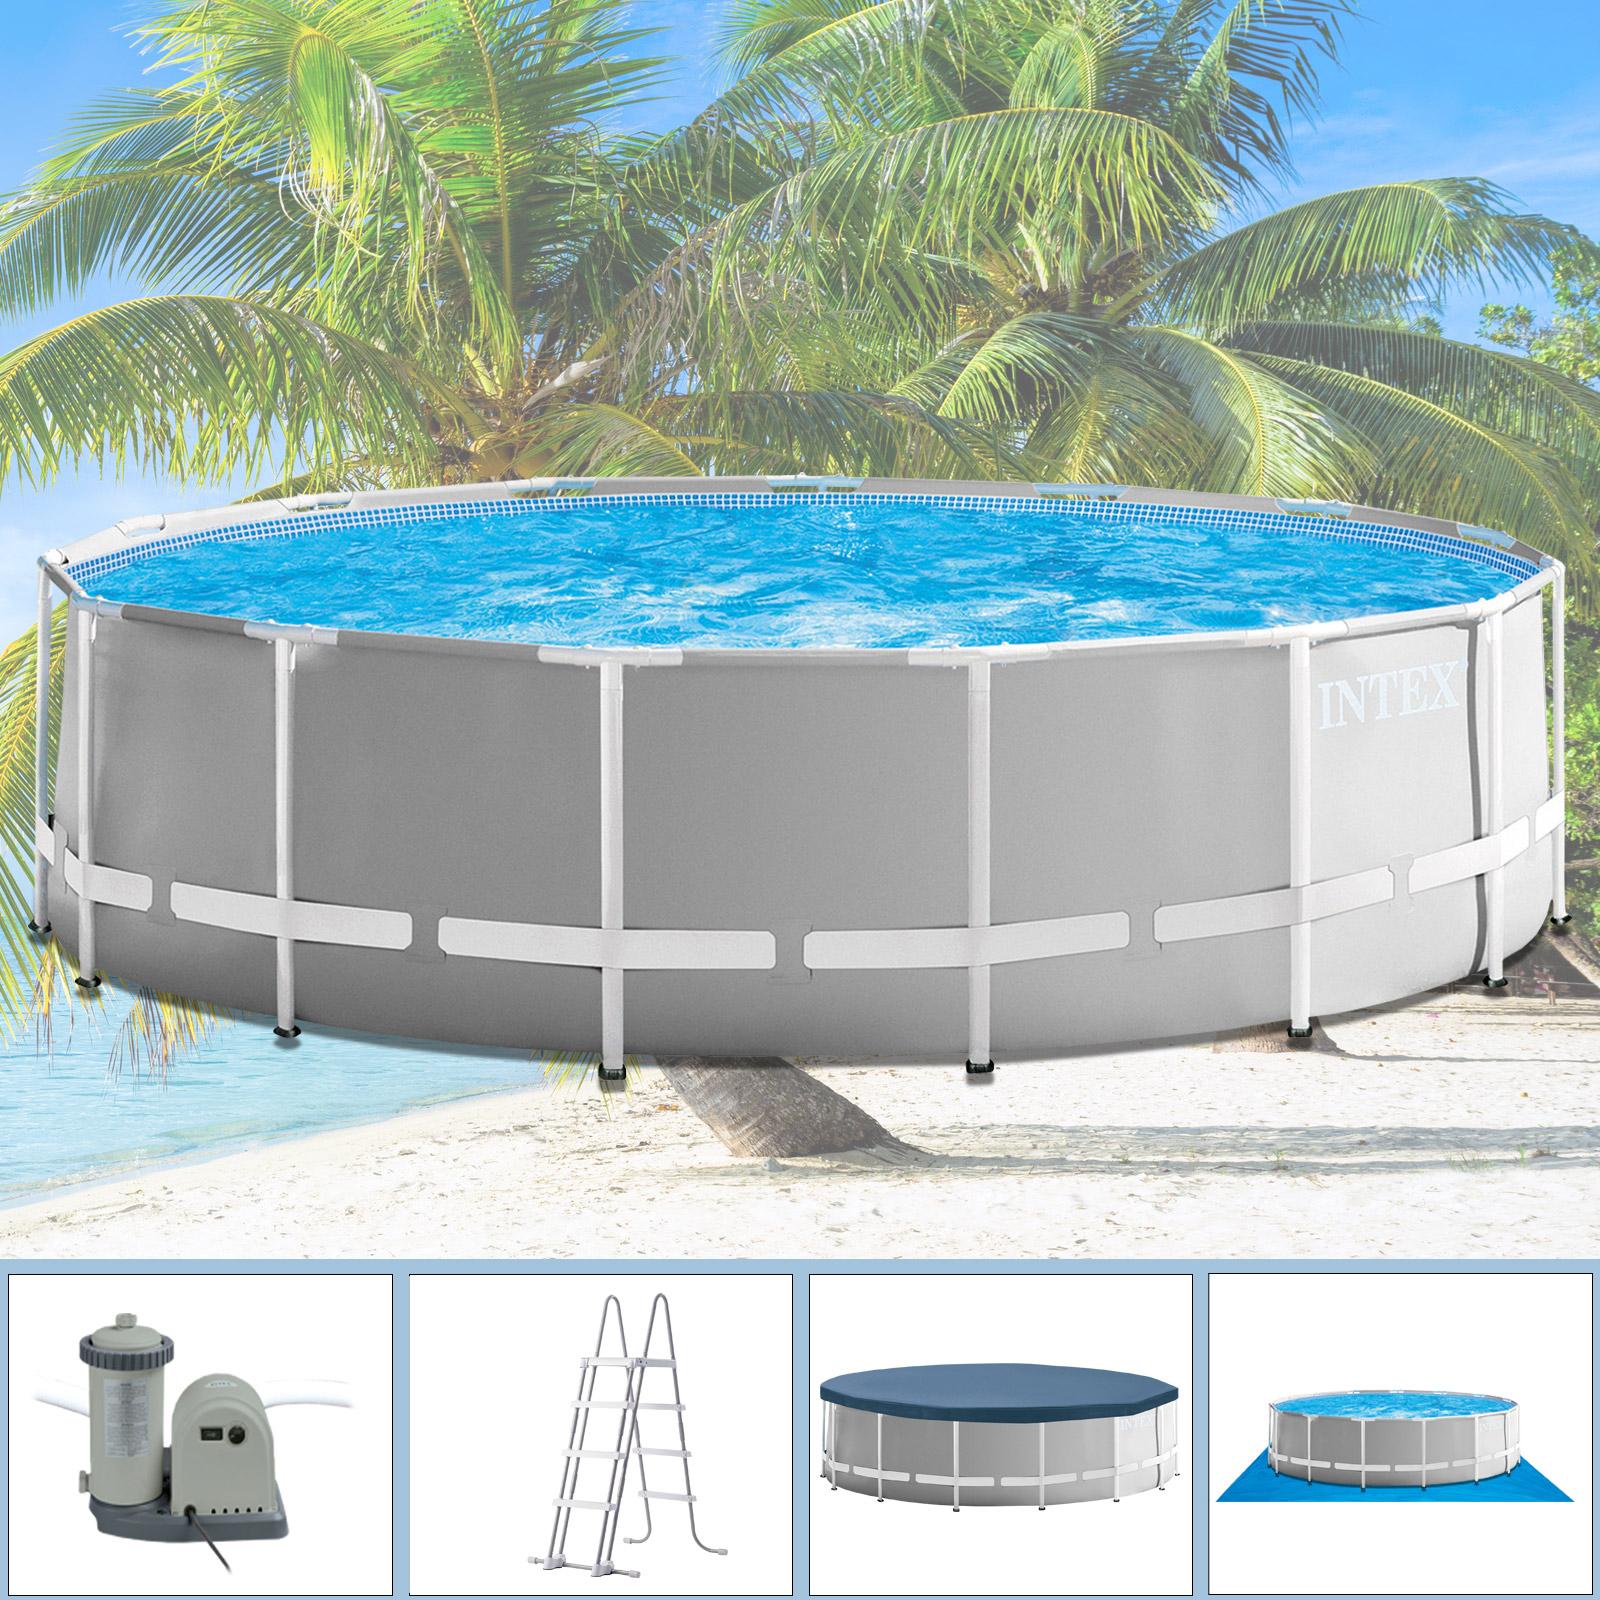 Intex Swimming Pool Ø 549 x 122 cm Frame Pool Set Prism Rondo